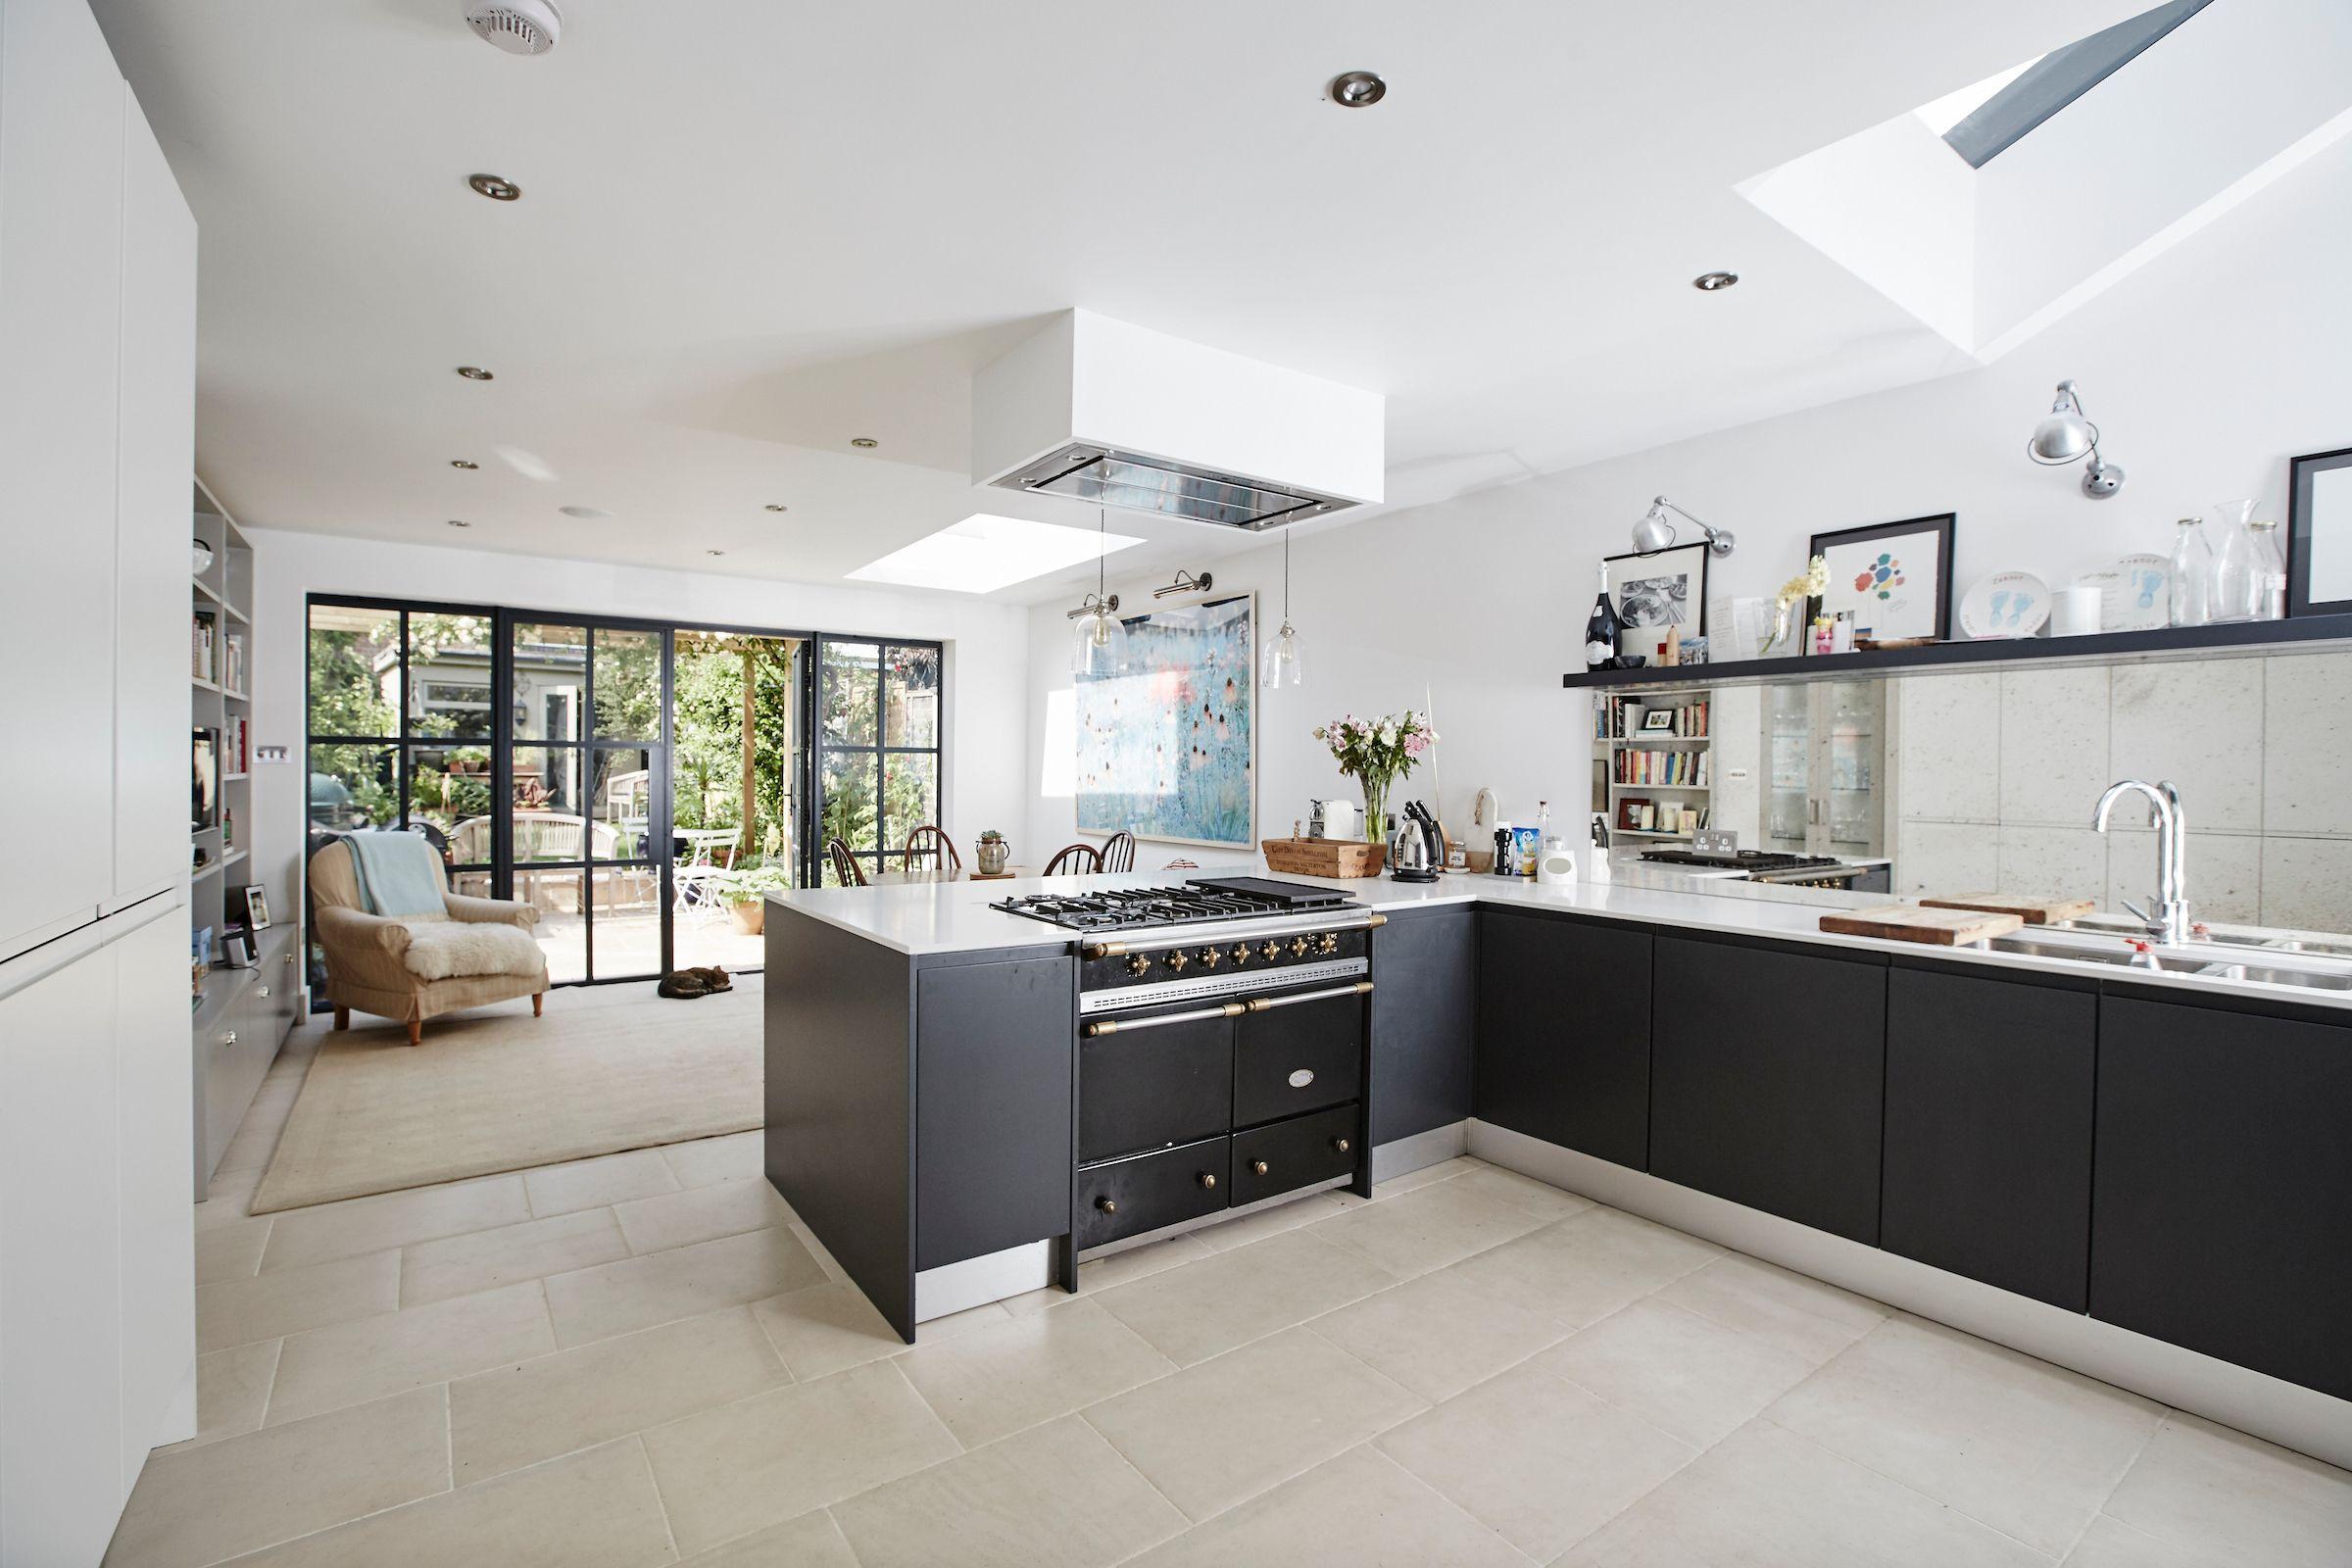 0098_Jun 09 2016.jpg | London kitchen, Kitchen extension